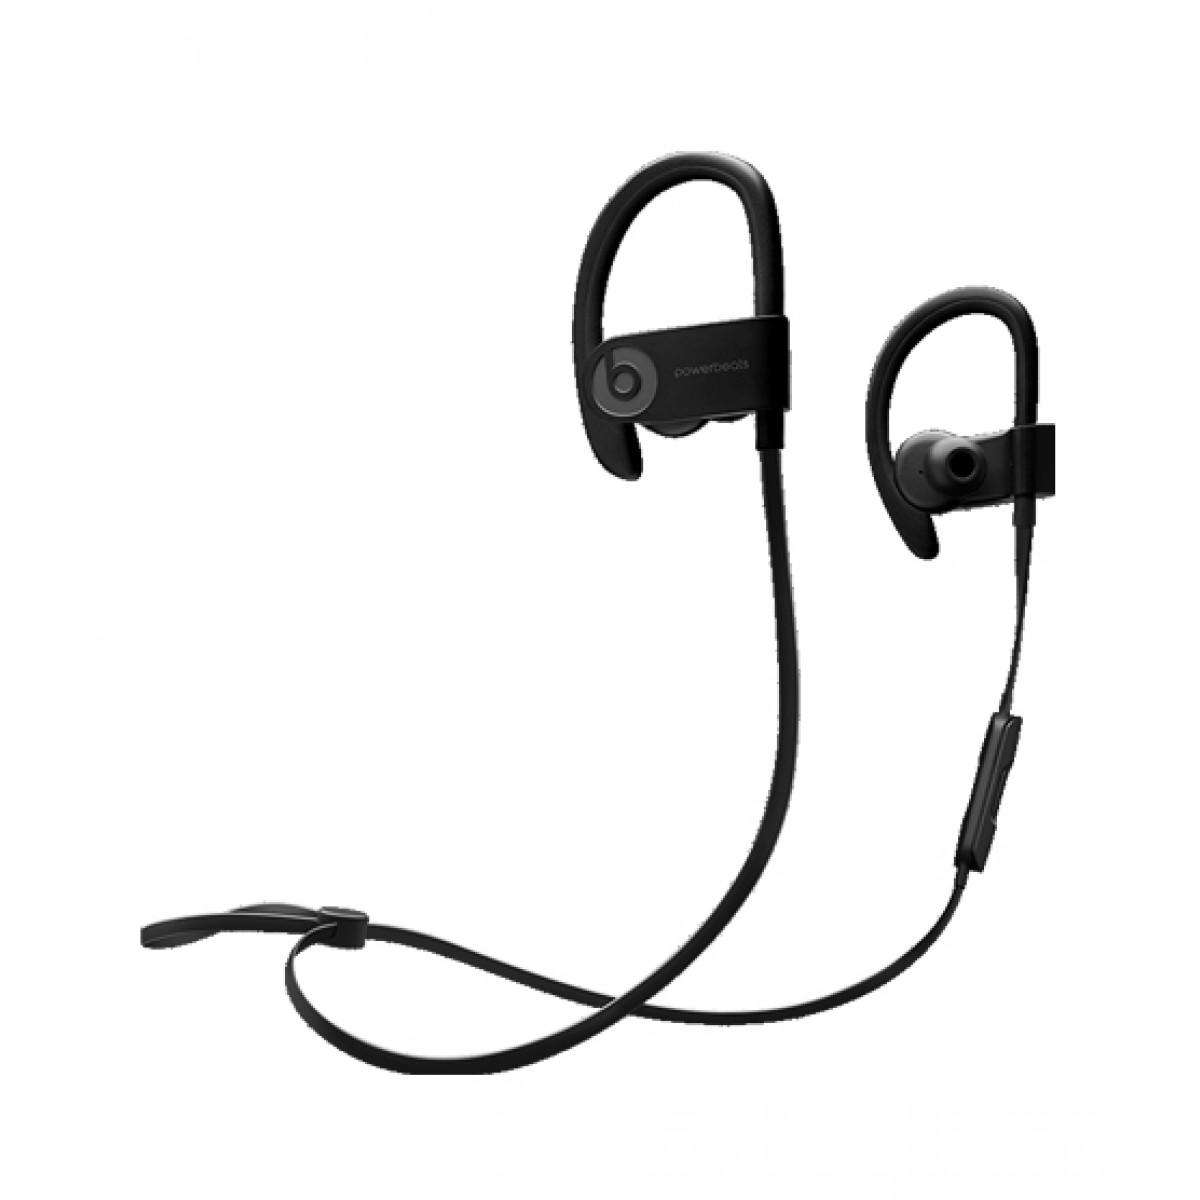 Beats Powerbeats3 Wireless Bluetooth Earphones Black